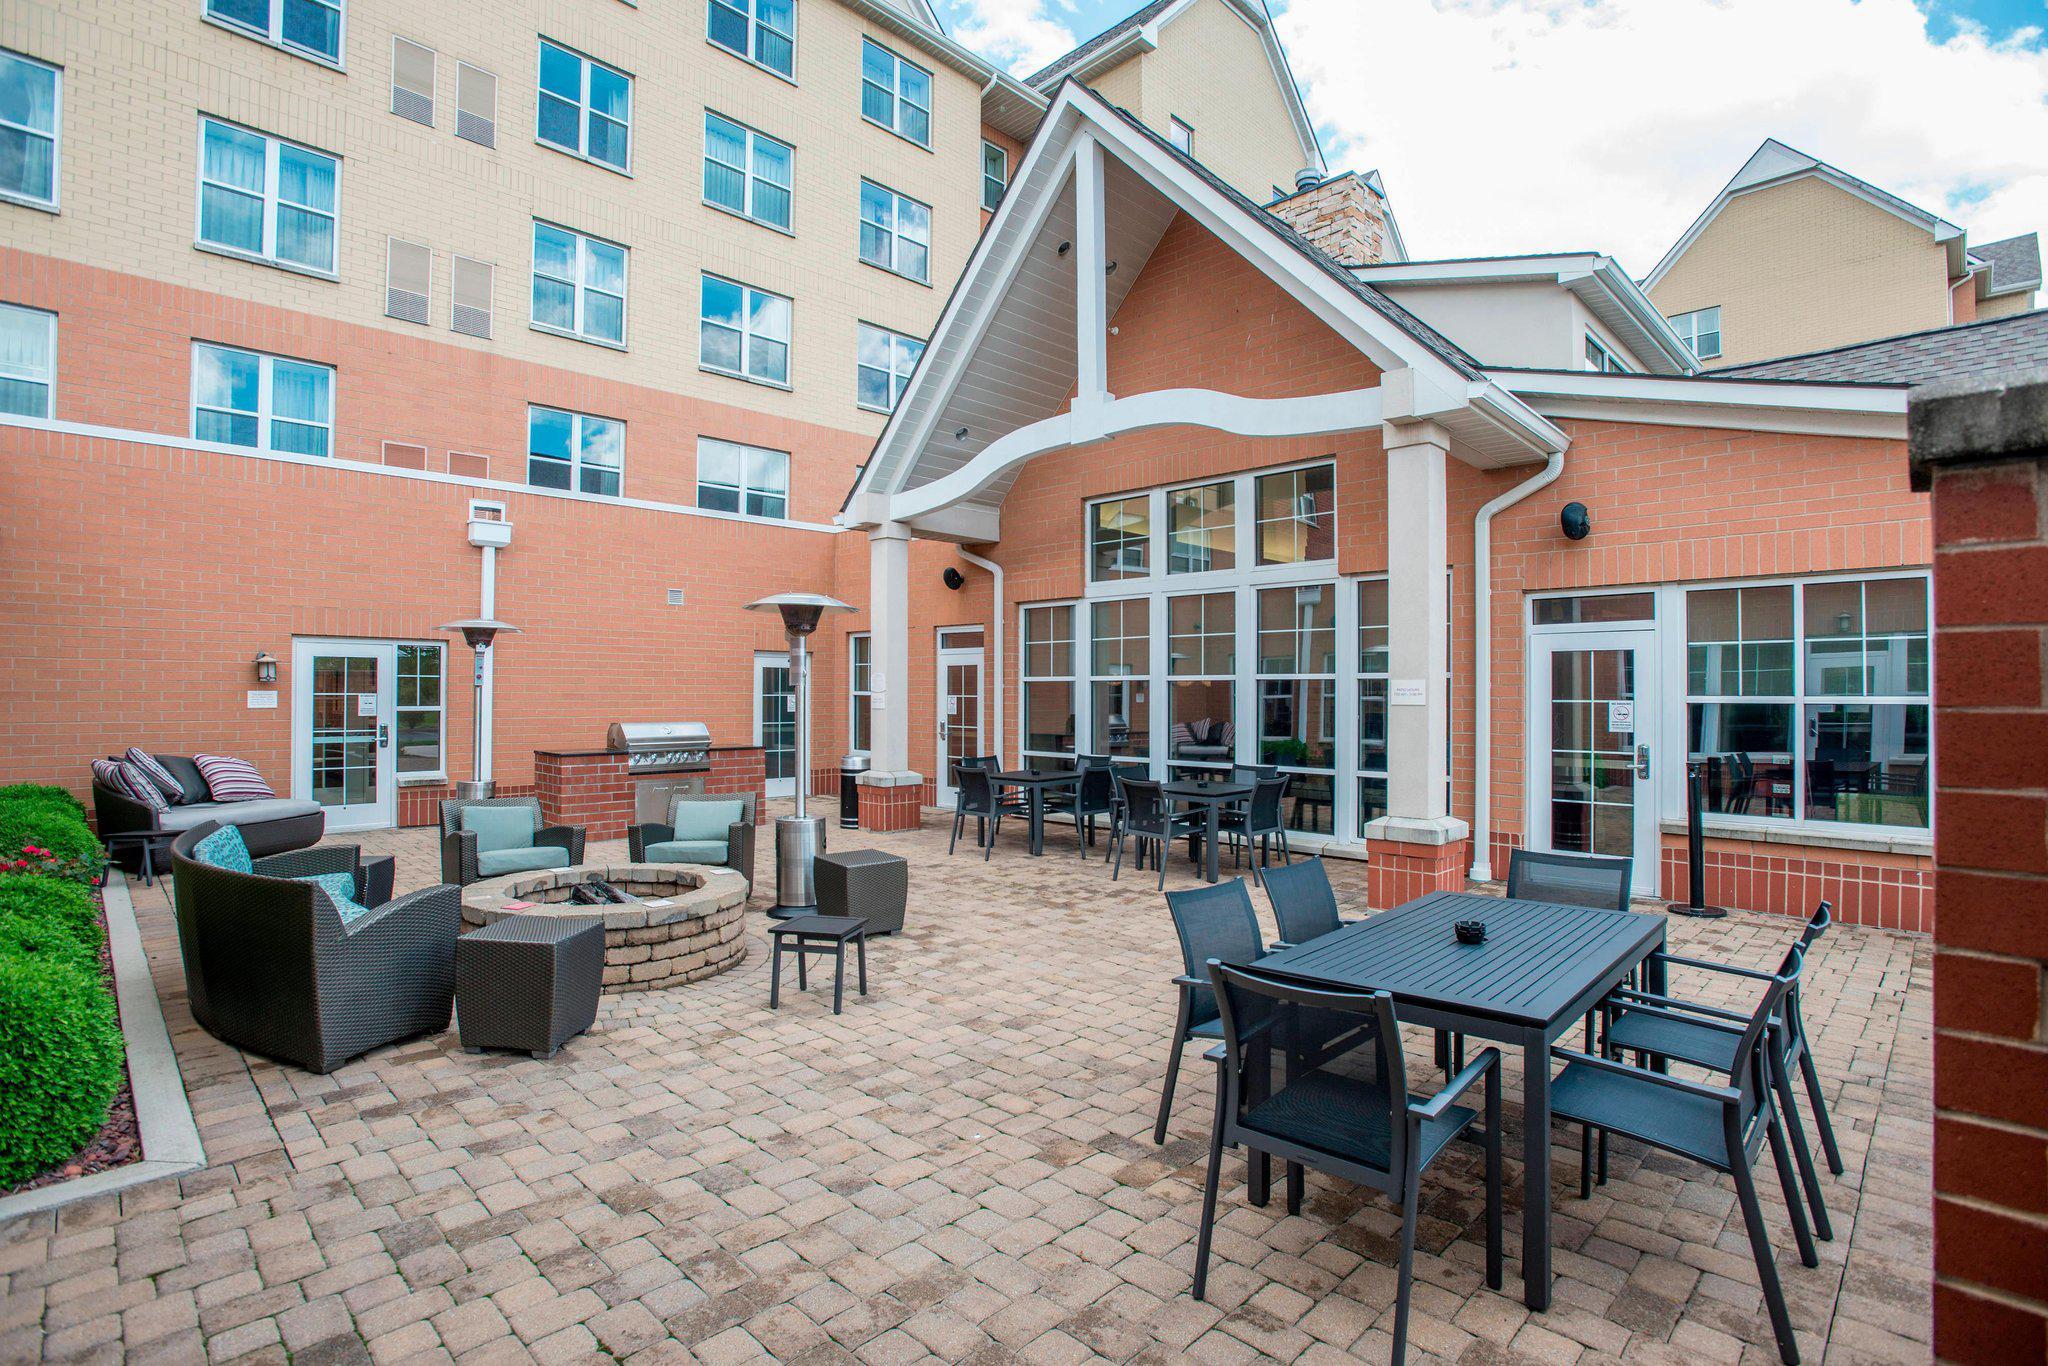 Residence Inn by Marriott Cincinnati North/West Chester